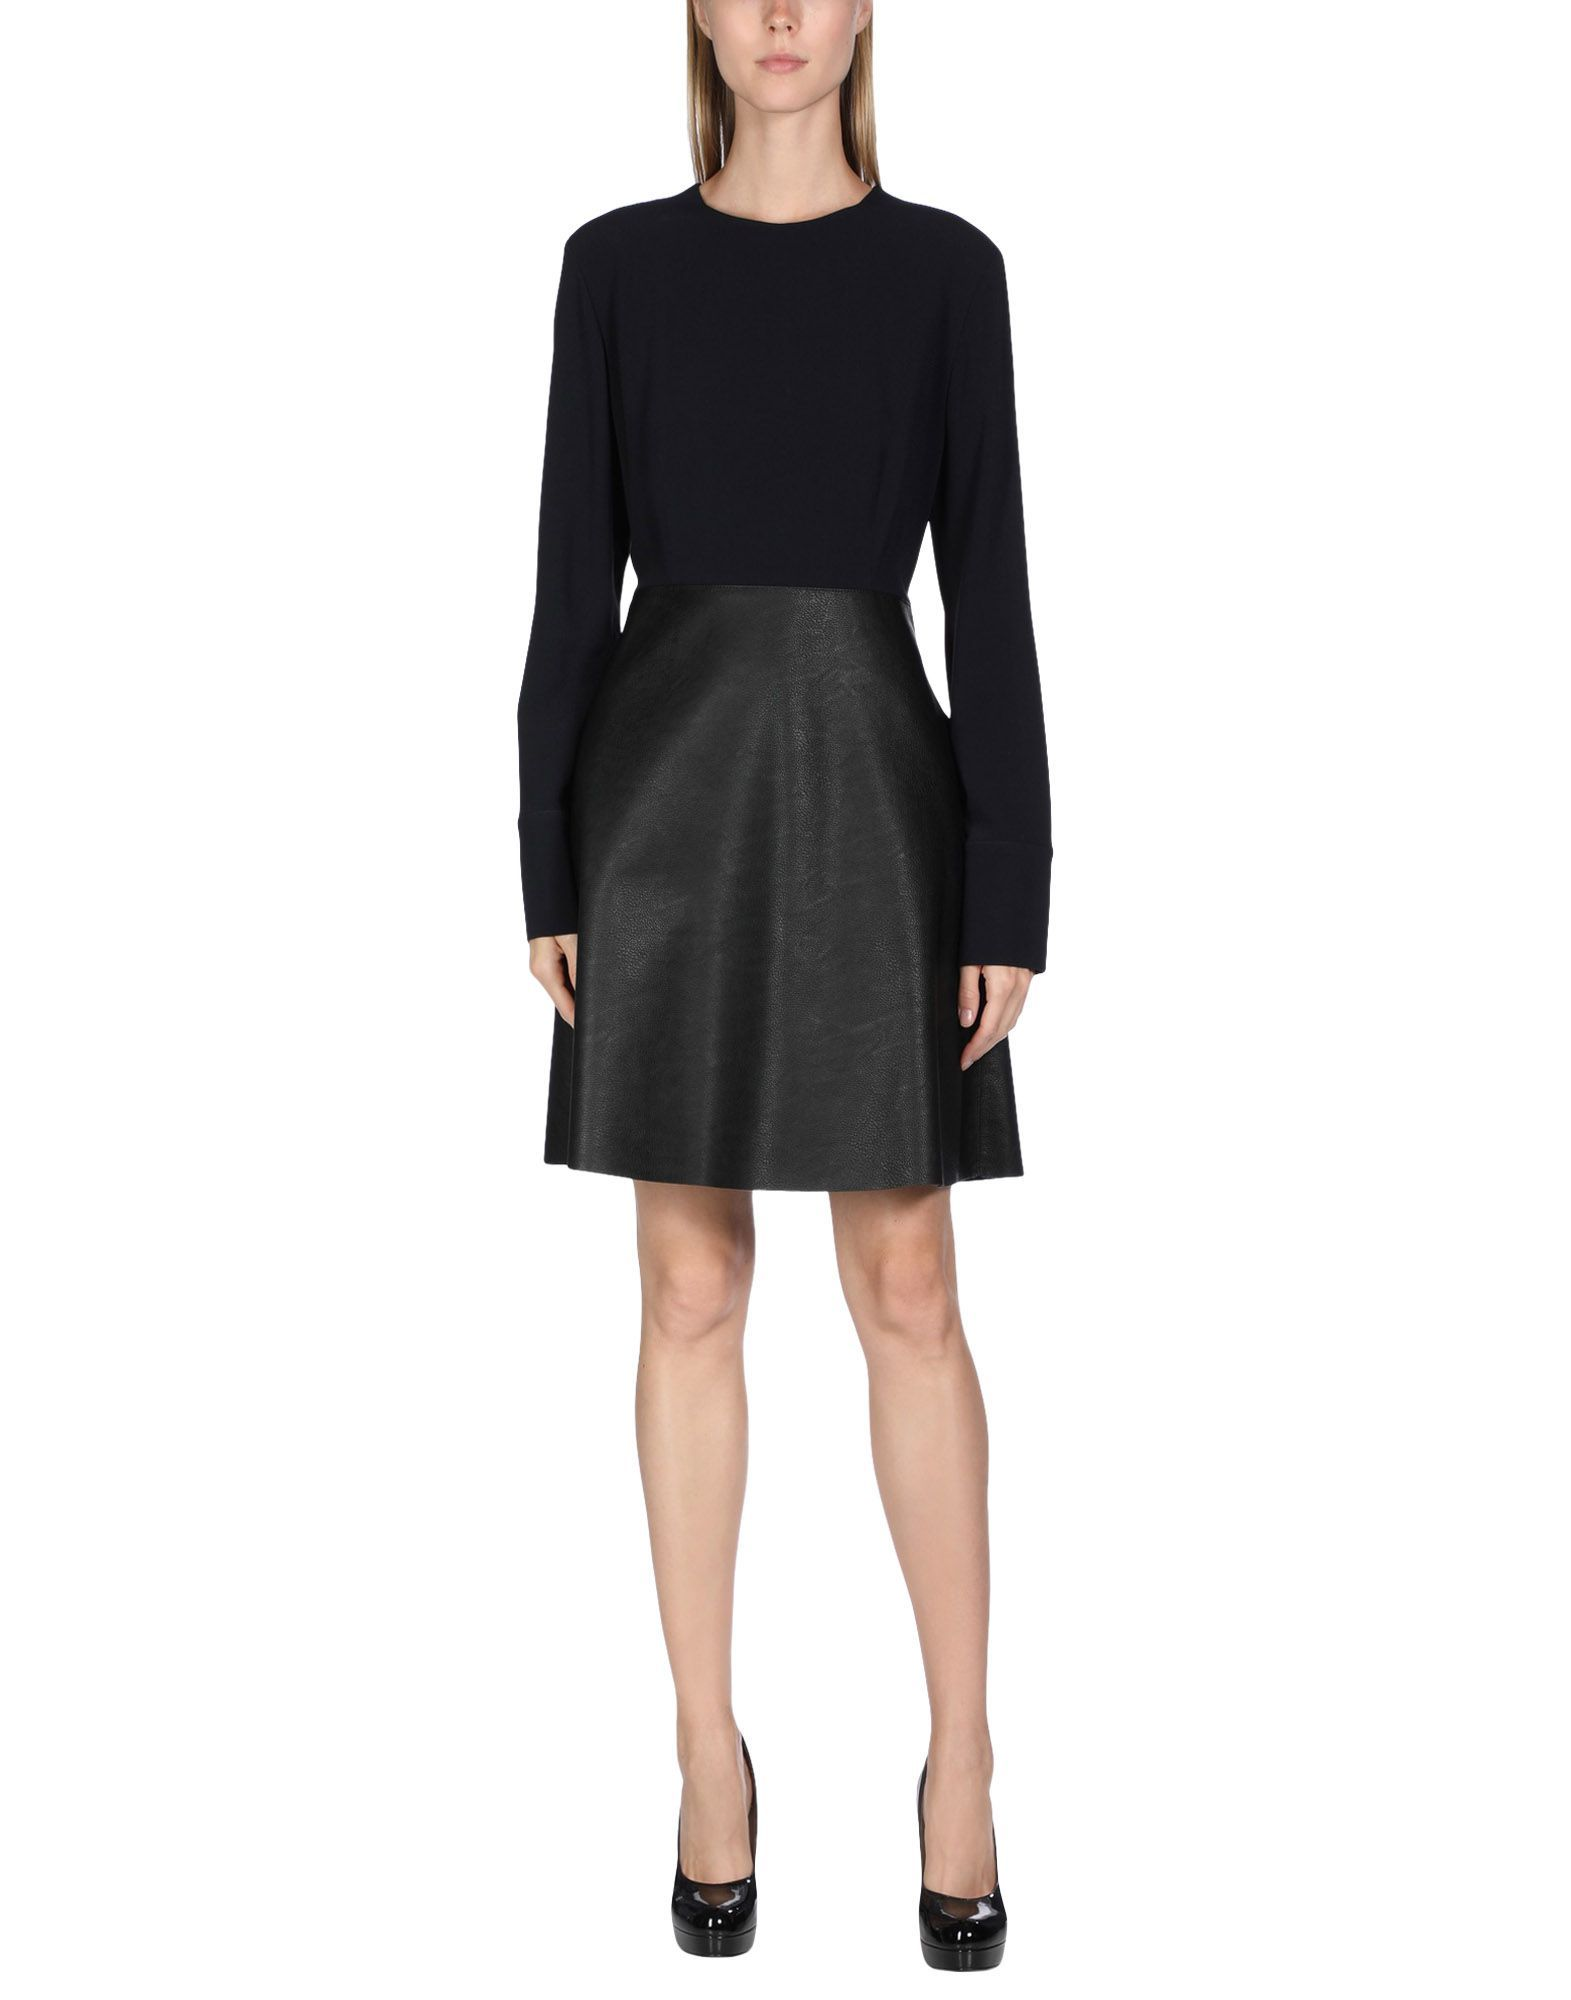 19351847b688a2 Stella Mccartney Short Dress - Women Stella Mccartney Short Dresses online  on YOOX United States -